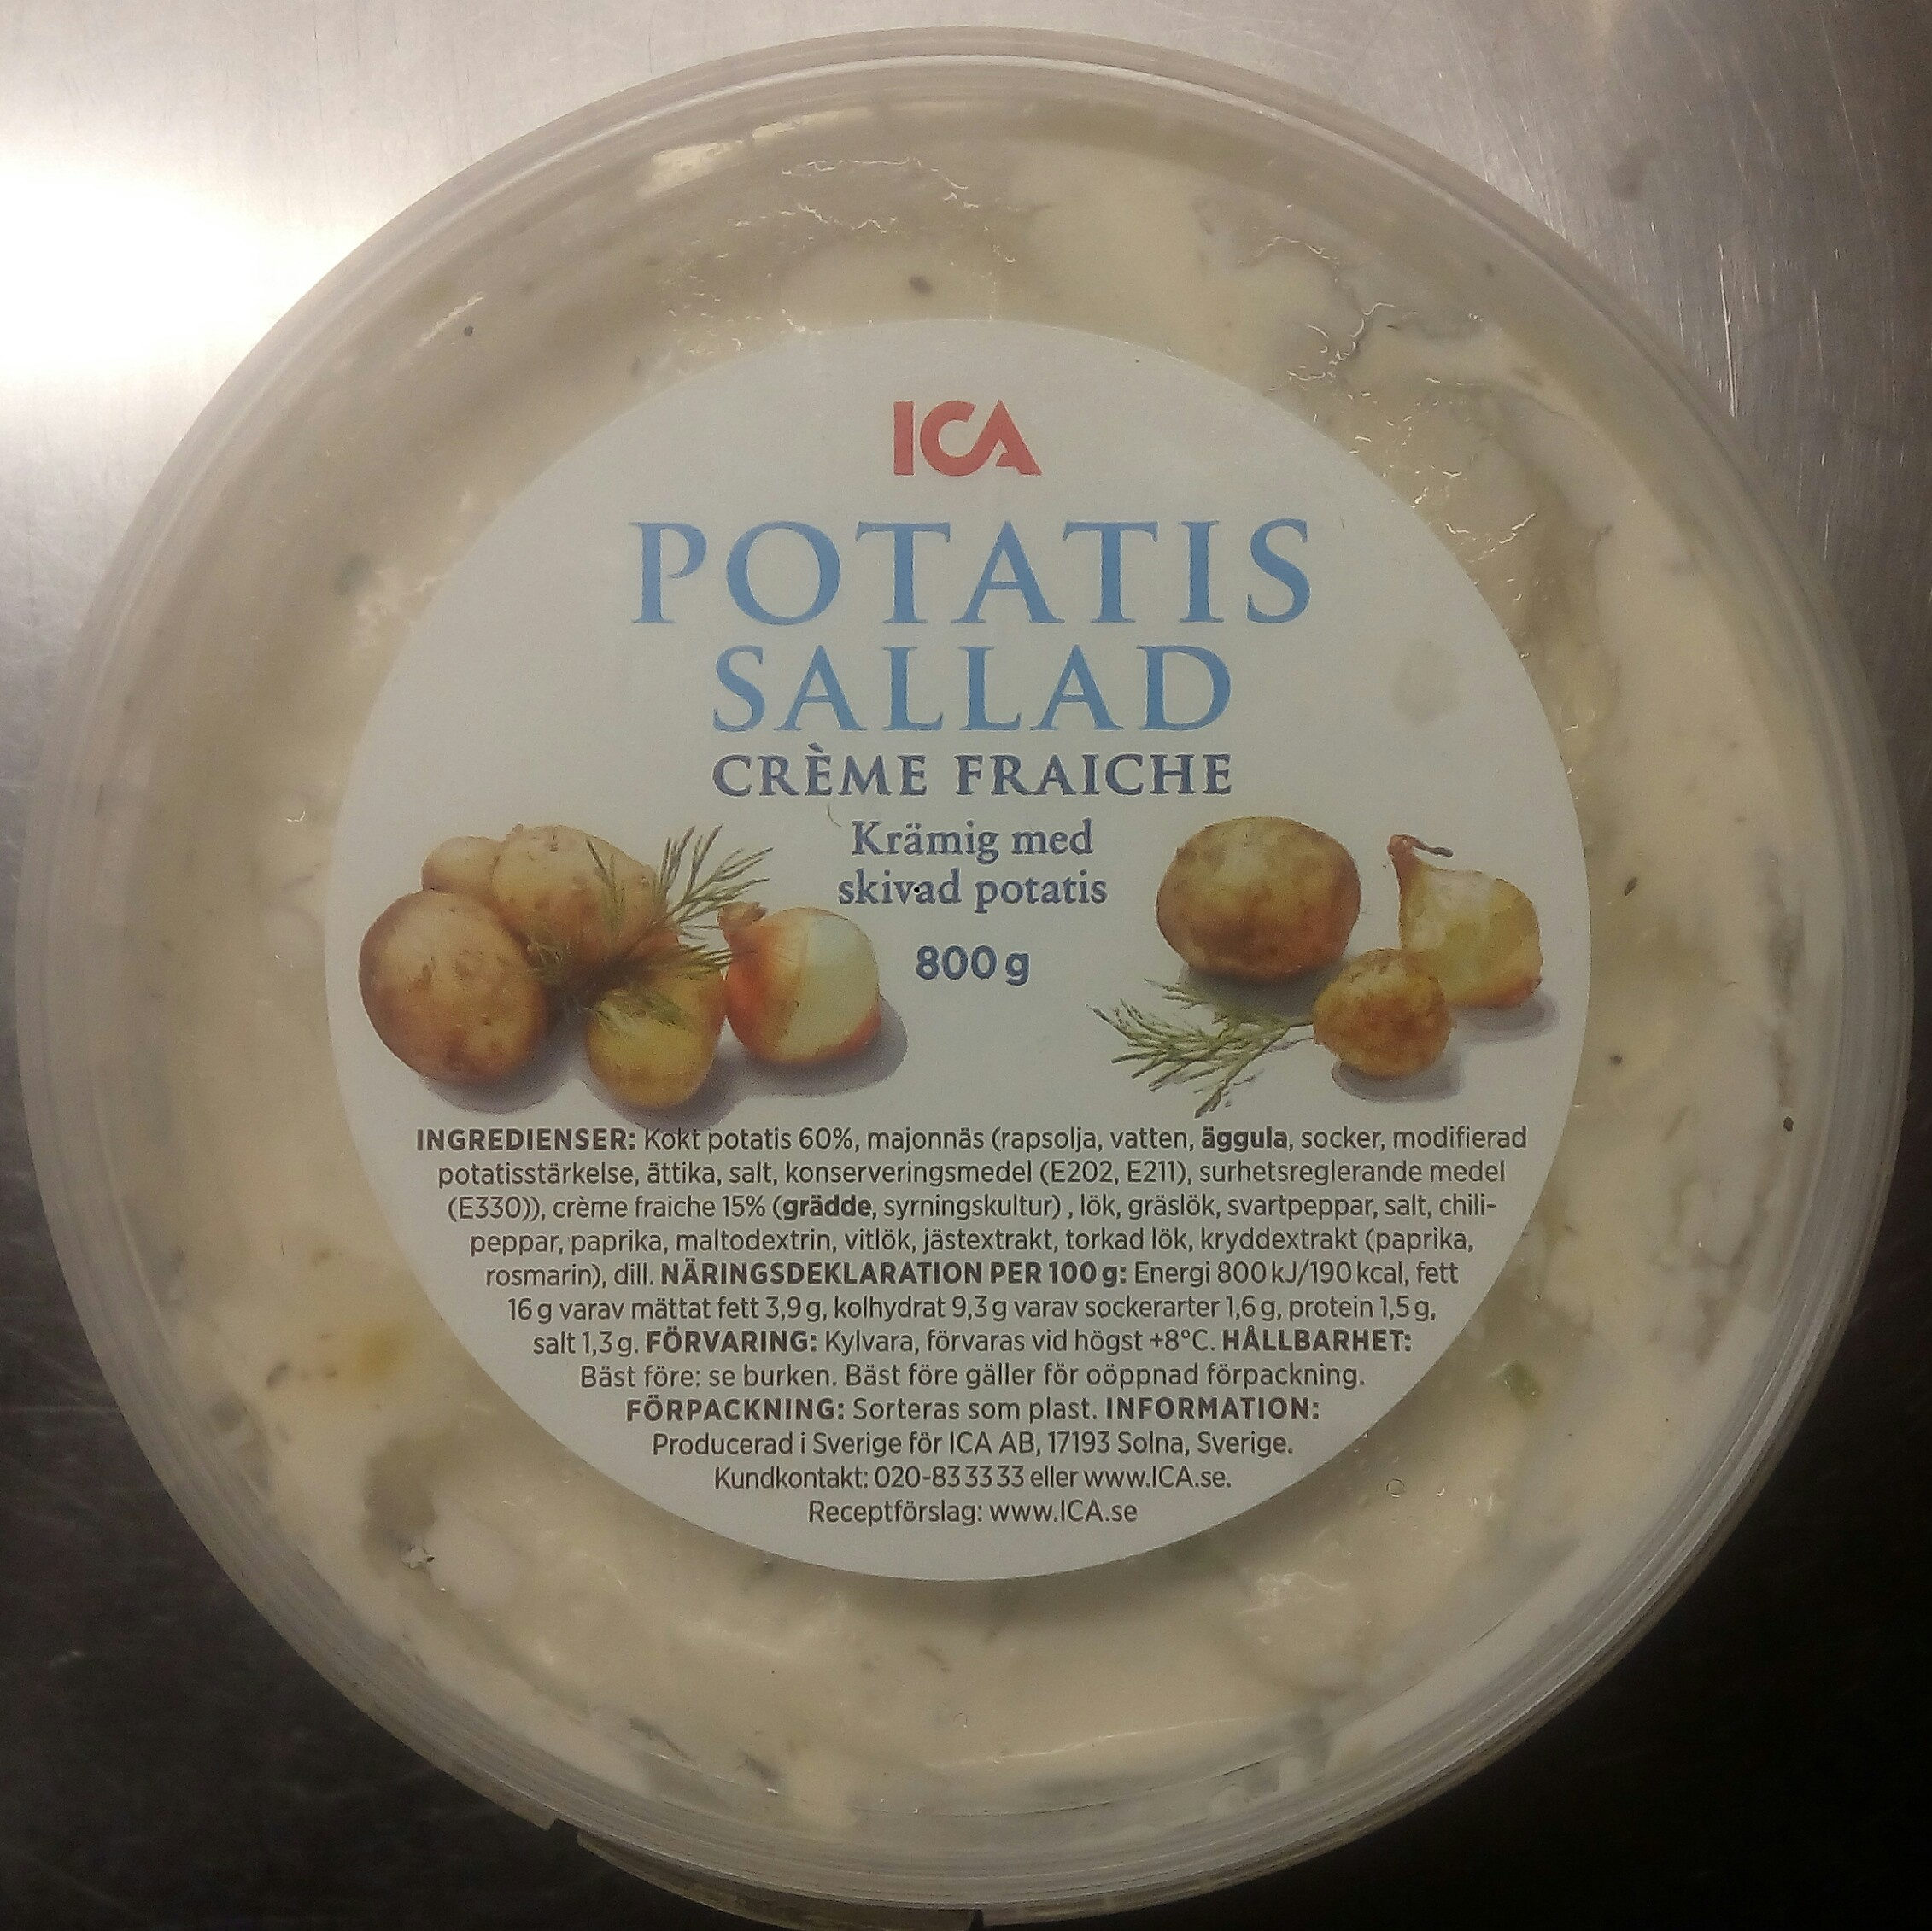 ICA Potatissallad Crème Fraiche - Product